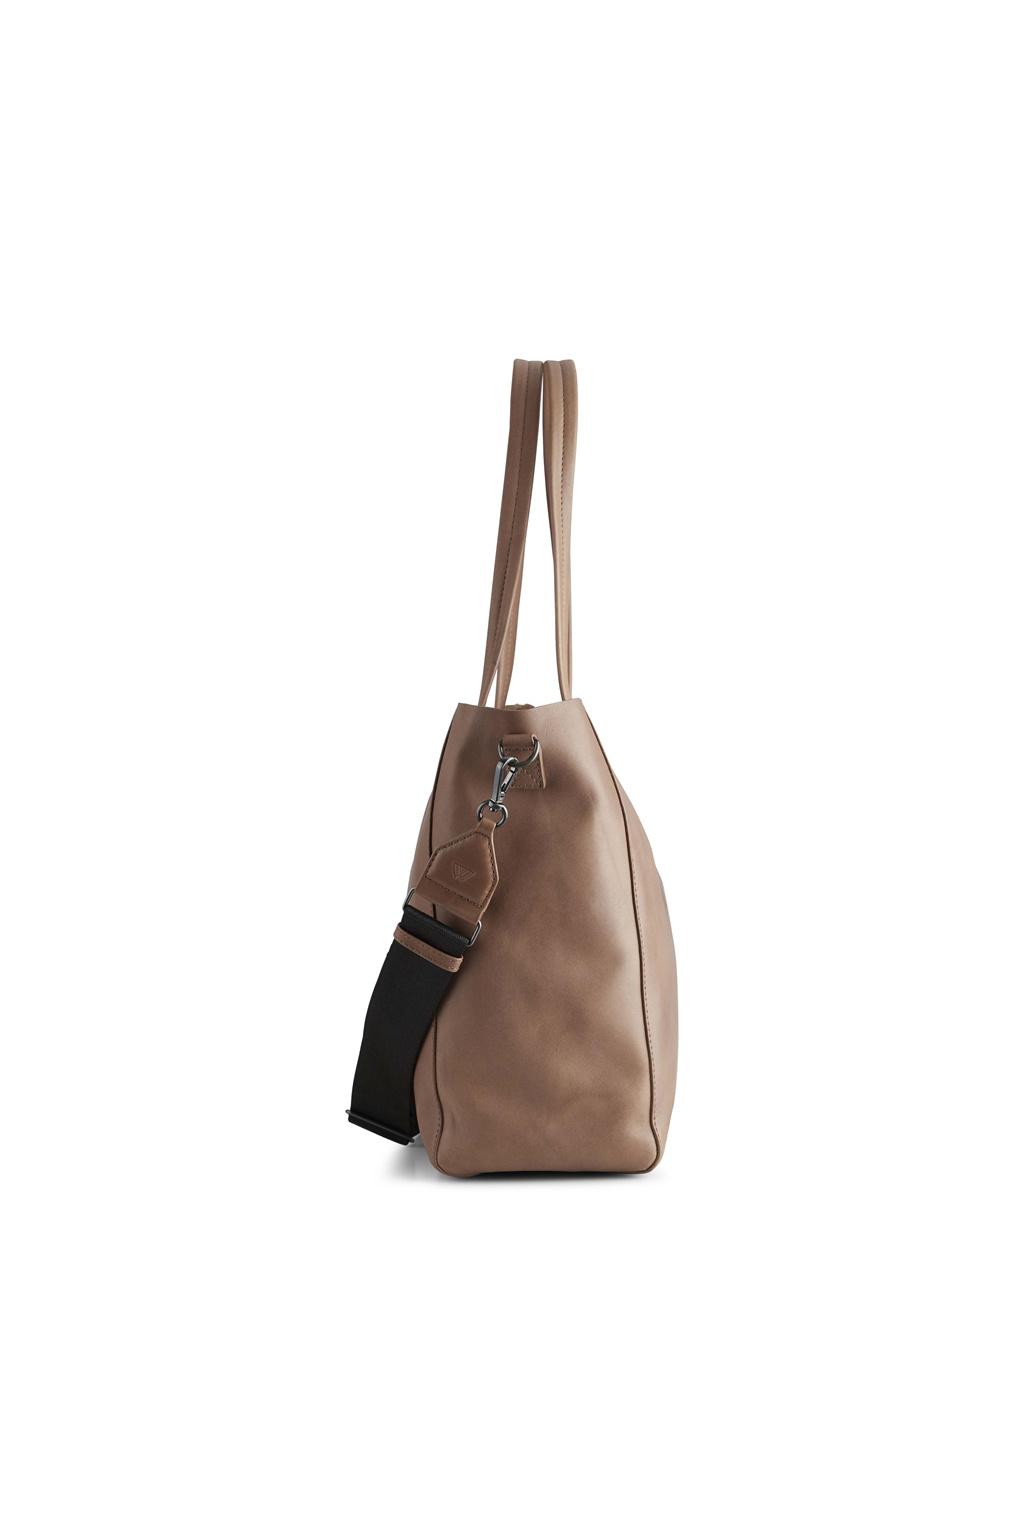 Reese Shopper Bag - Antique Caramel w/ Black-4